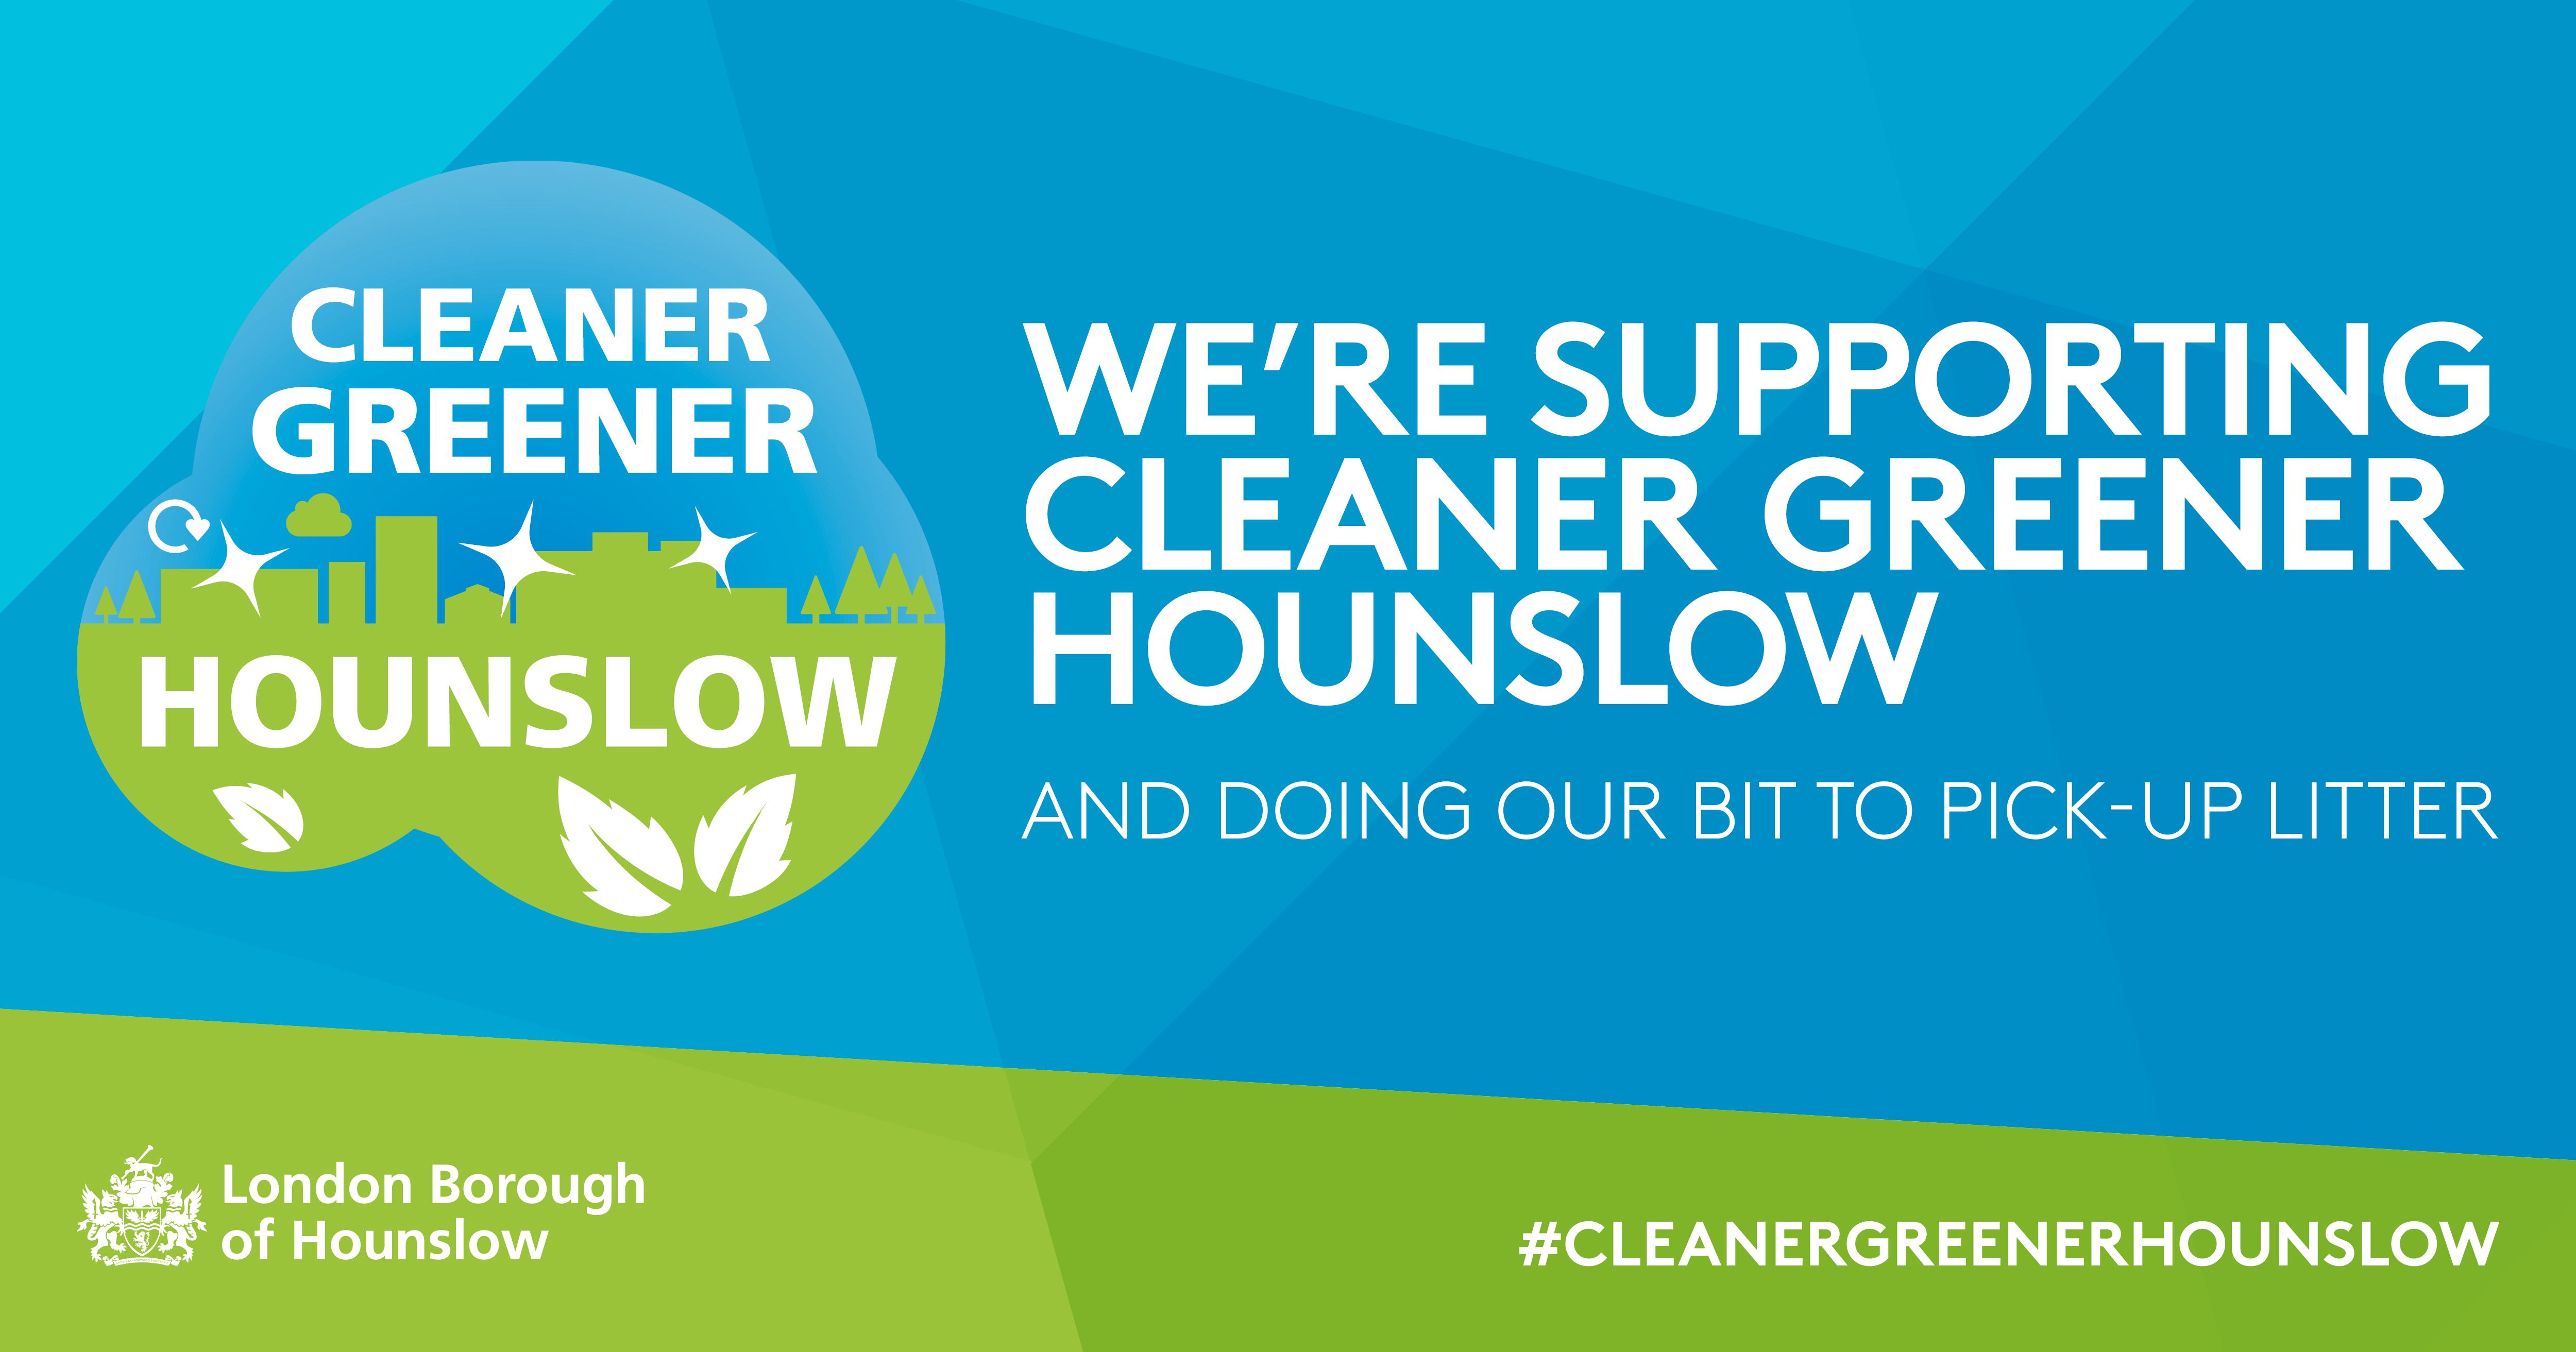 Cleaner Greener Campaign banner for Facebook